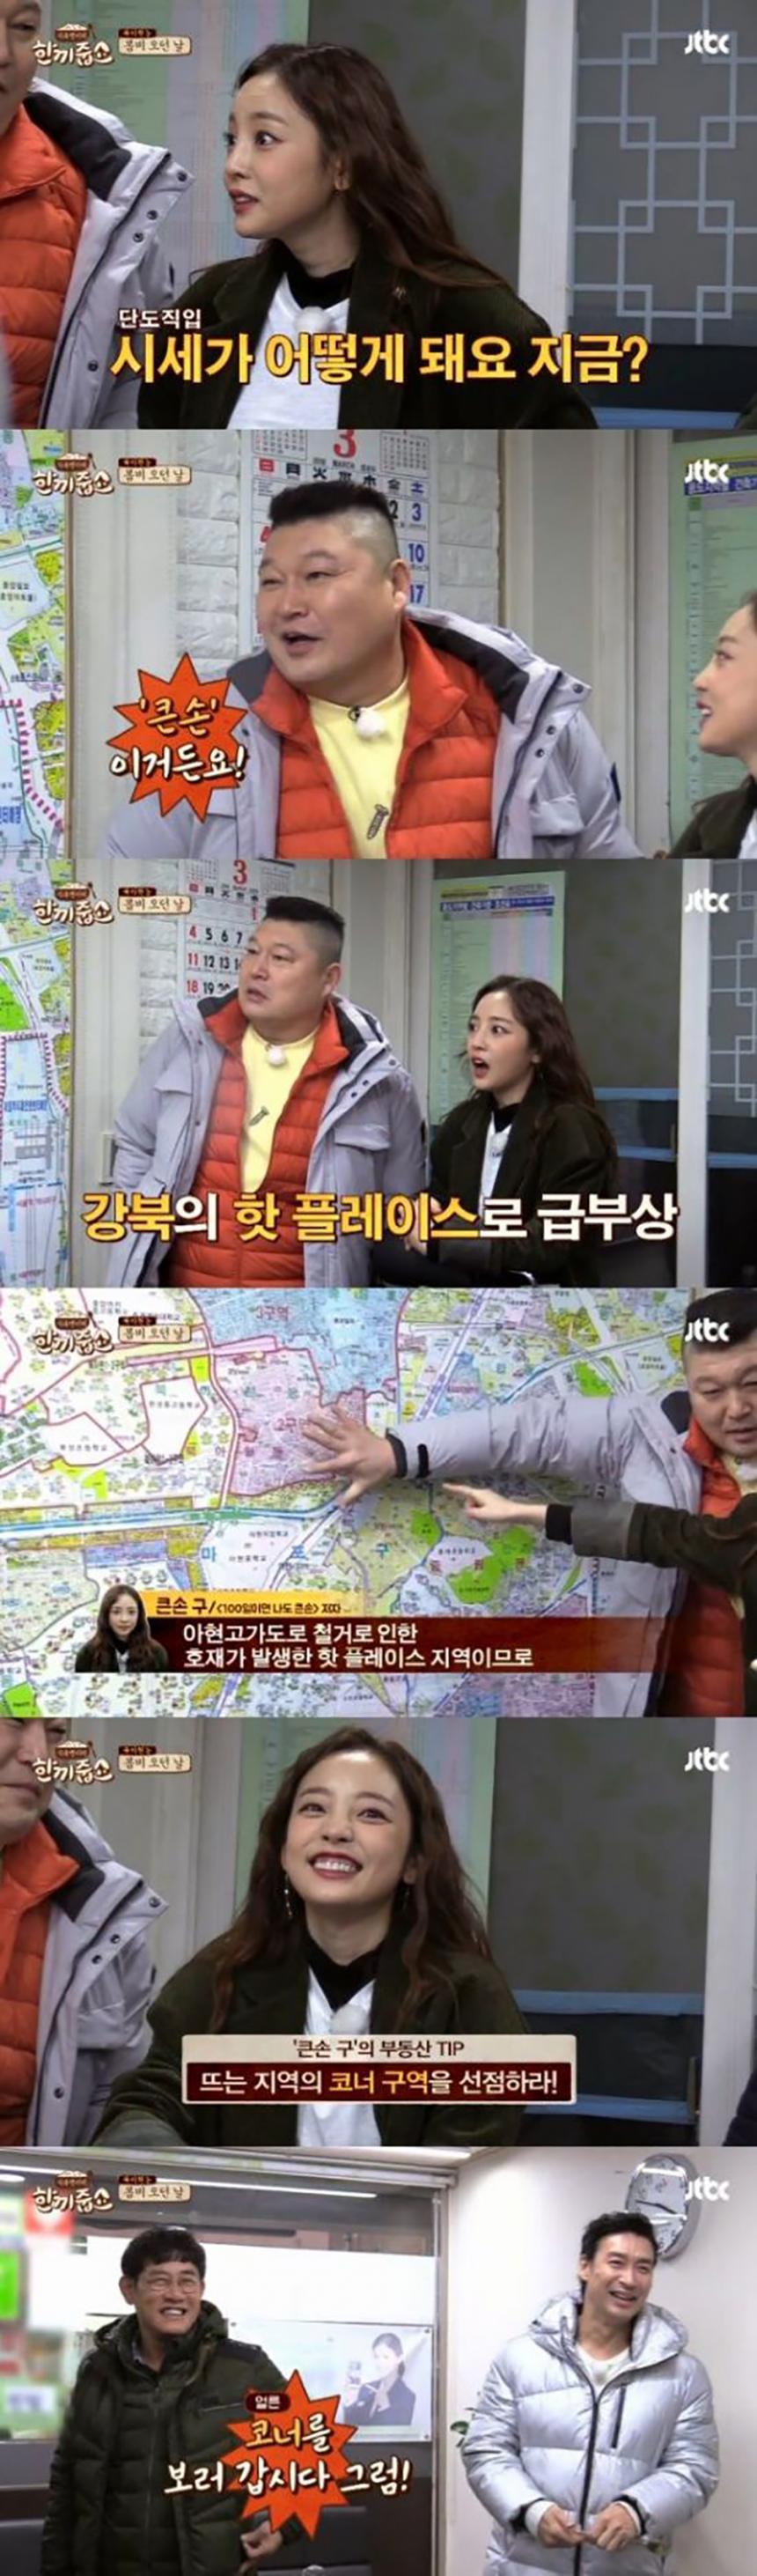 JTBC '한끼줍쇼' 방송 캡처